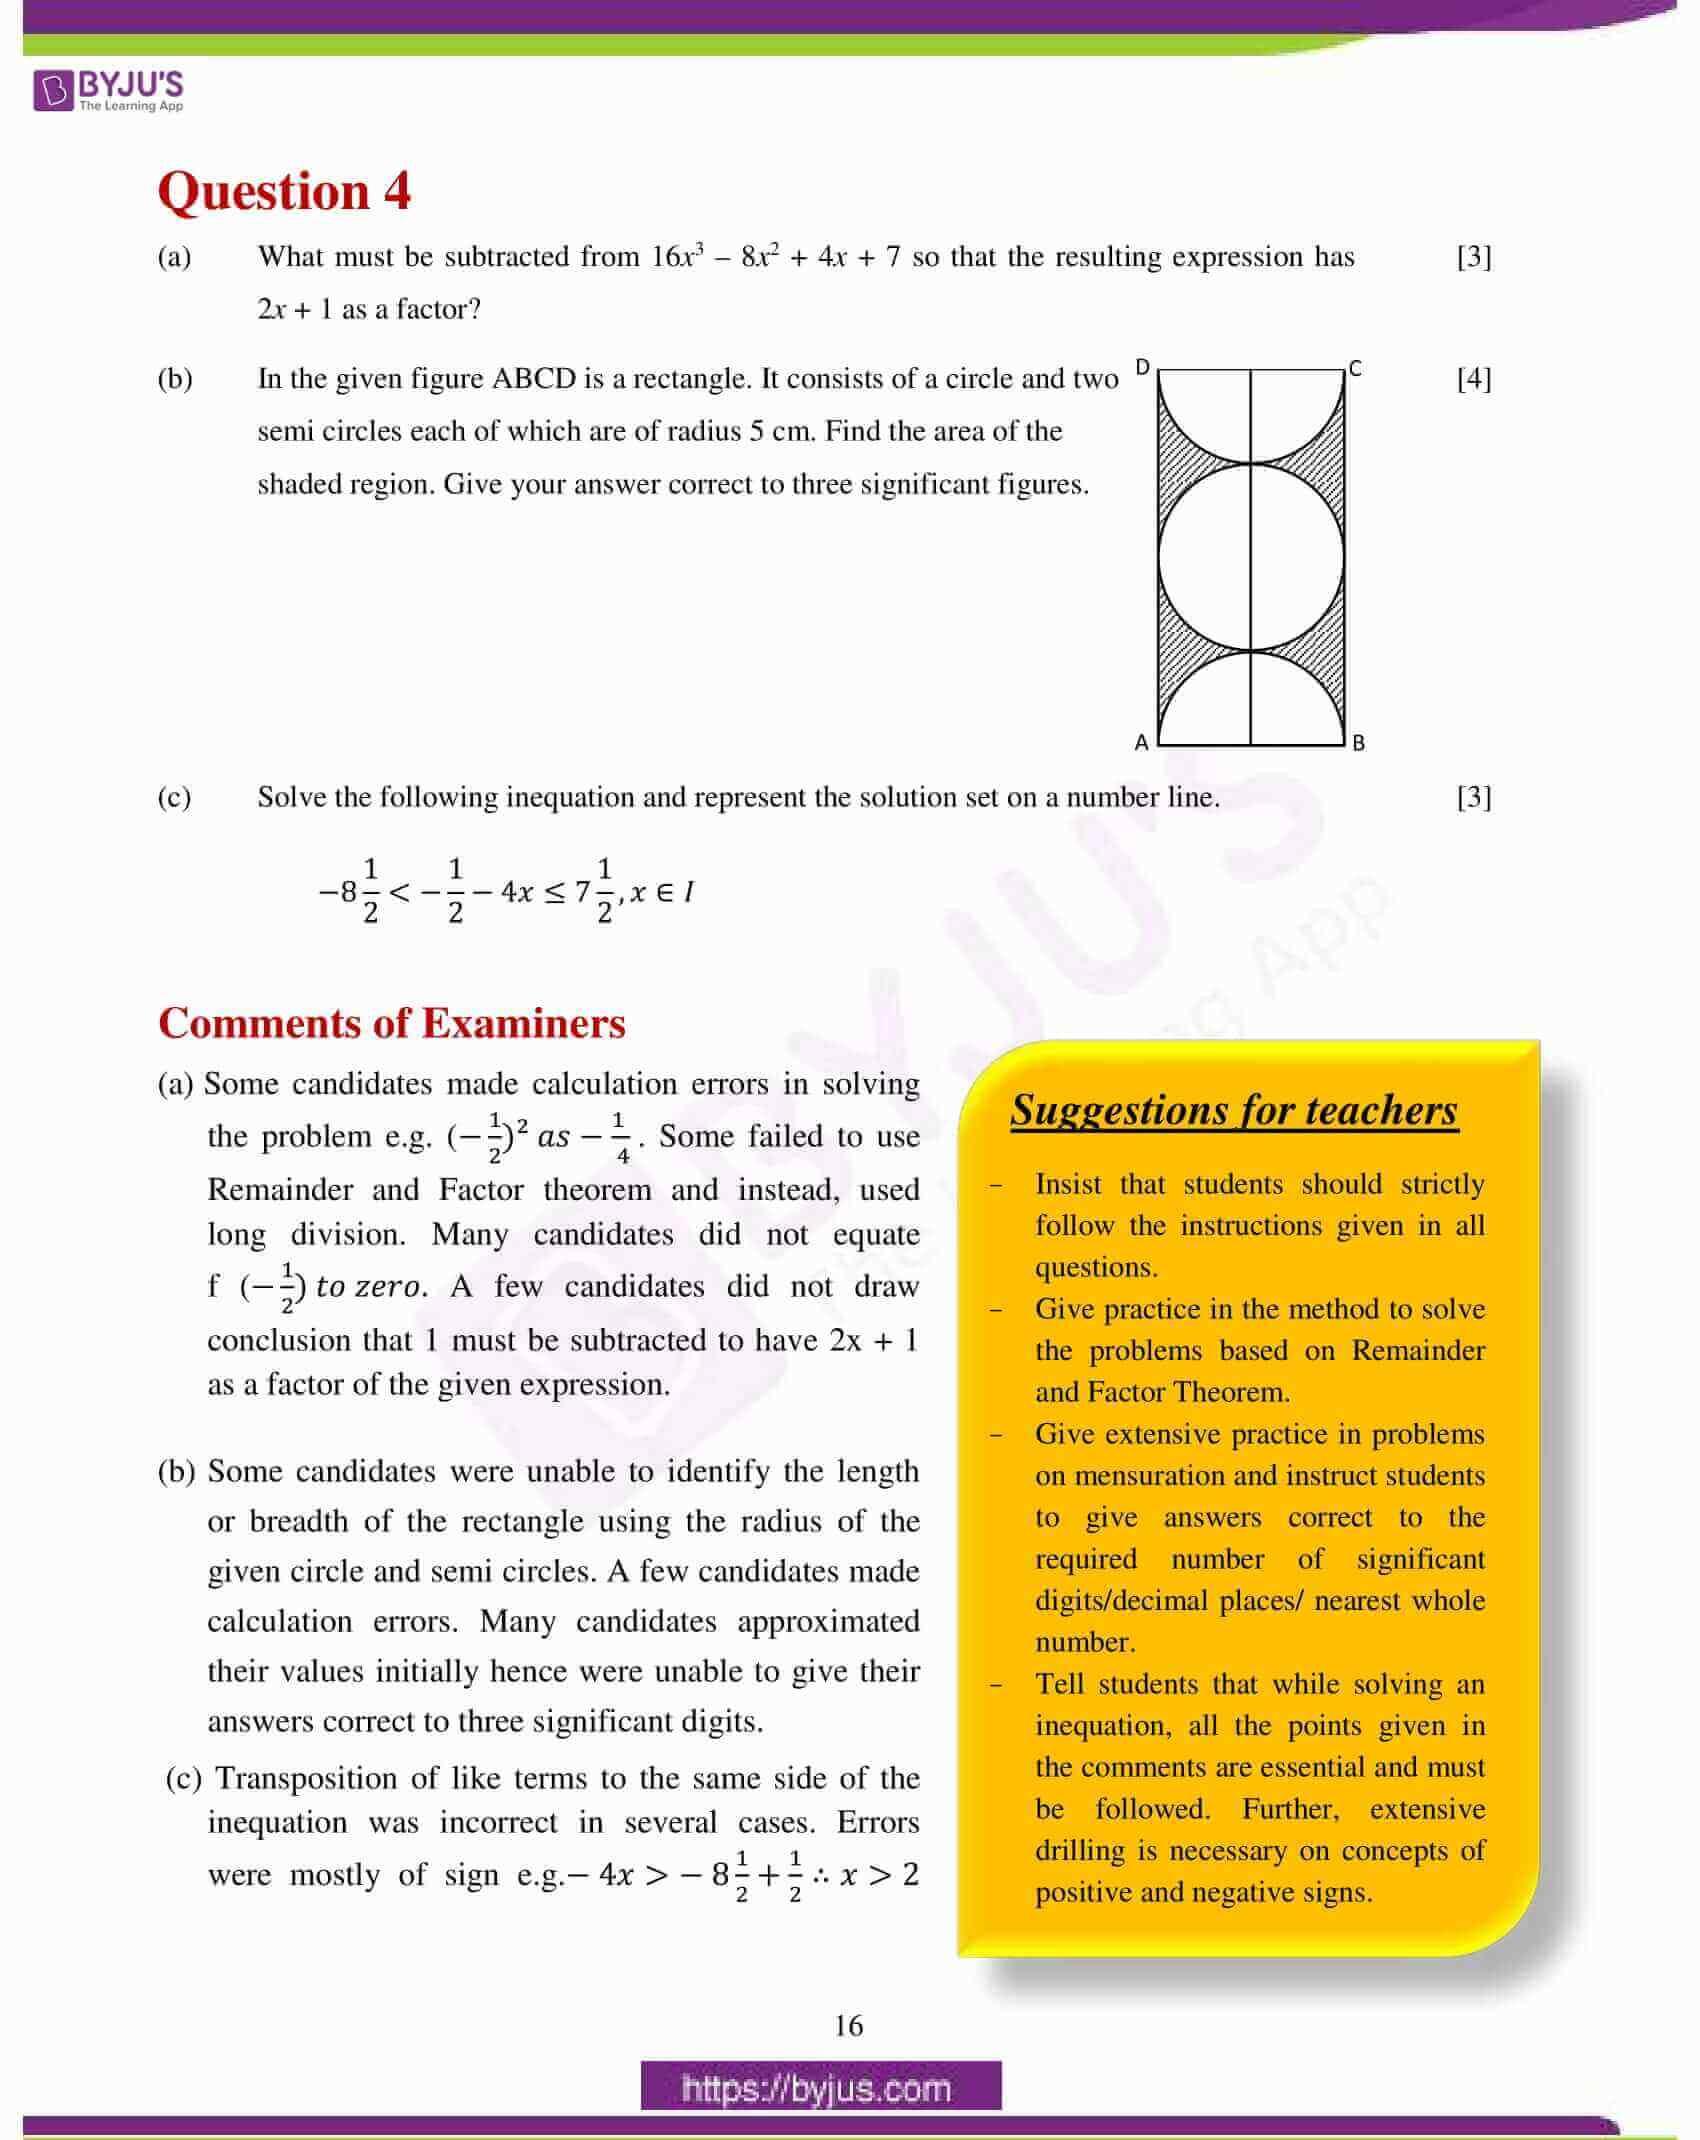 icse class 10 maths question paper solution 2017 07